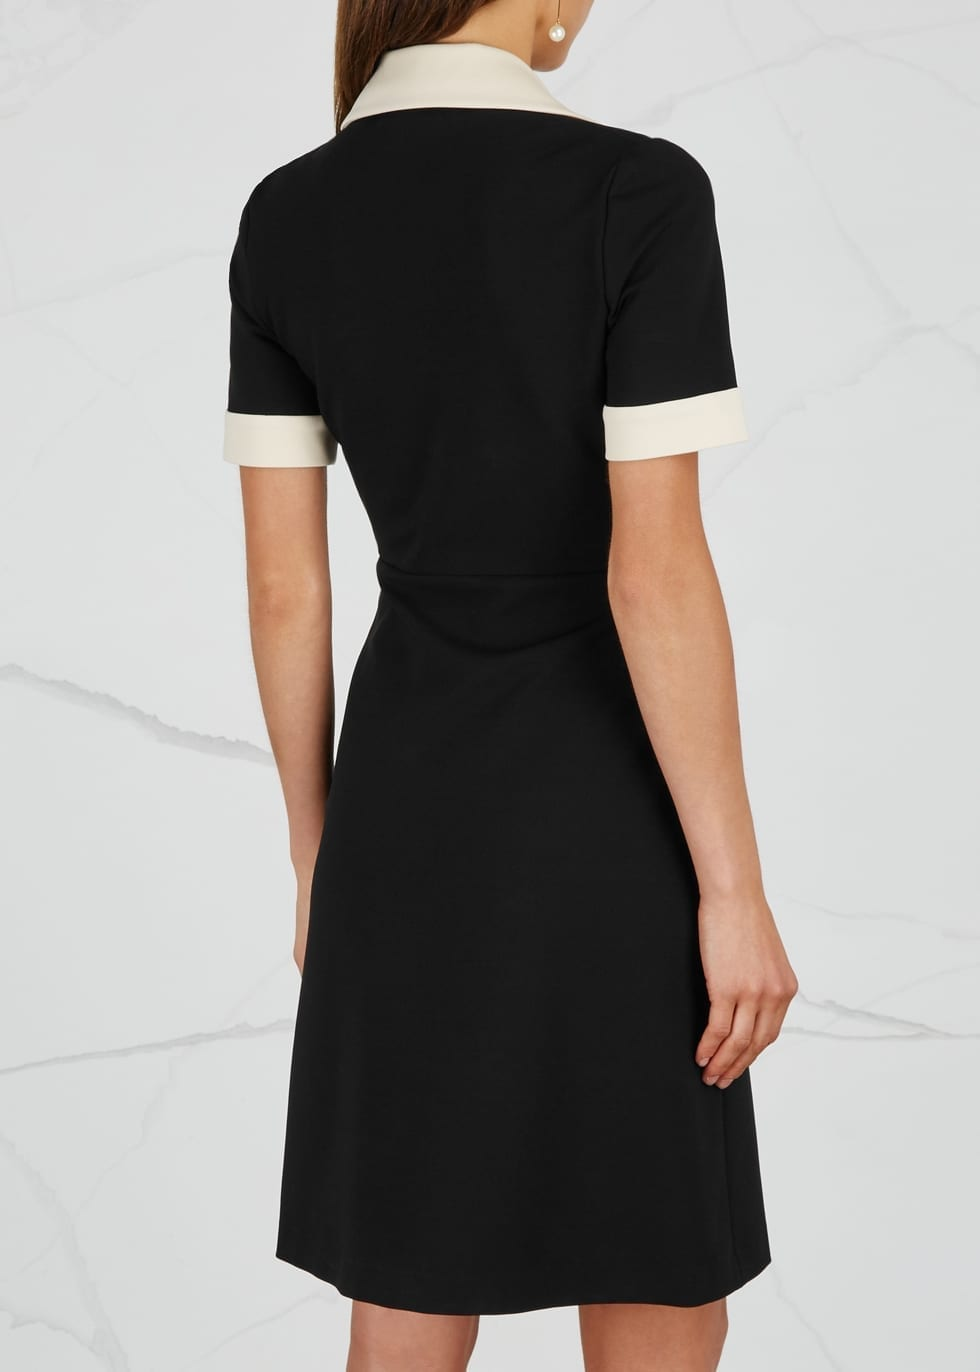 GUCCI Stretch Jersey Black Dress